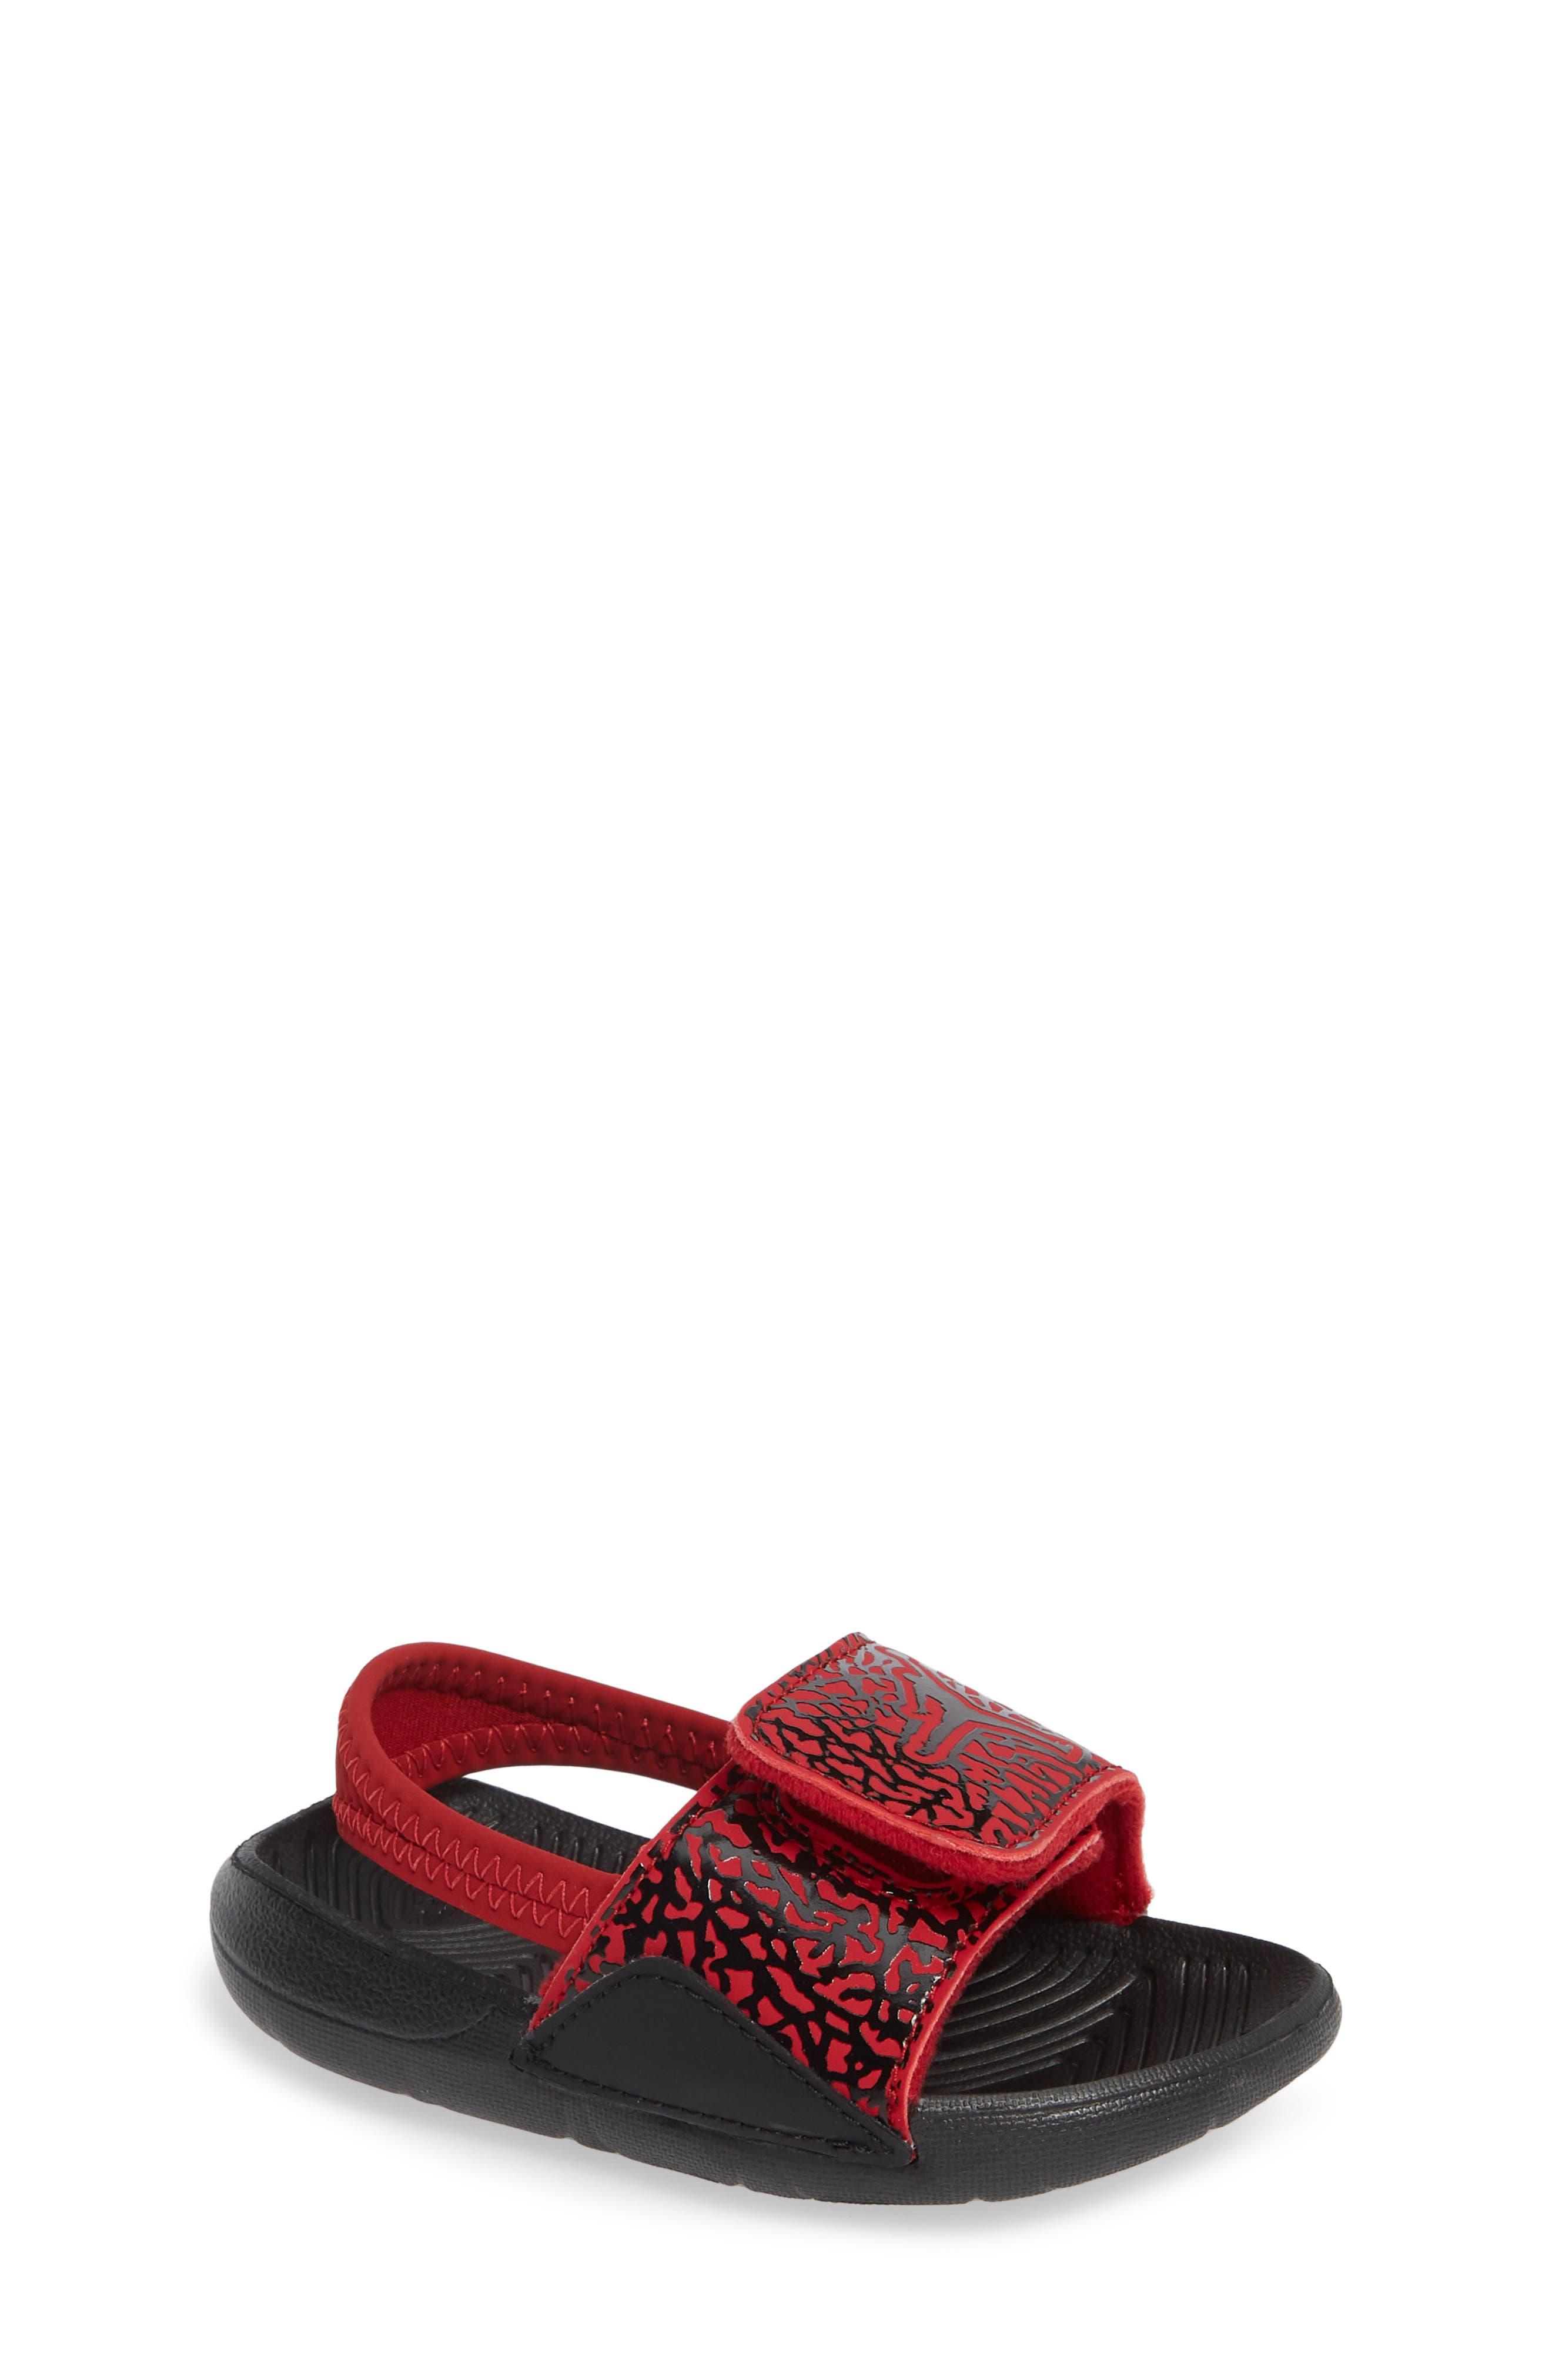 Hydro 7 V2 Sandal,                             Main thumbnail 1, color,                             GYM RED/ BLACK 2